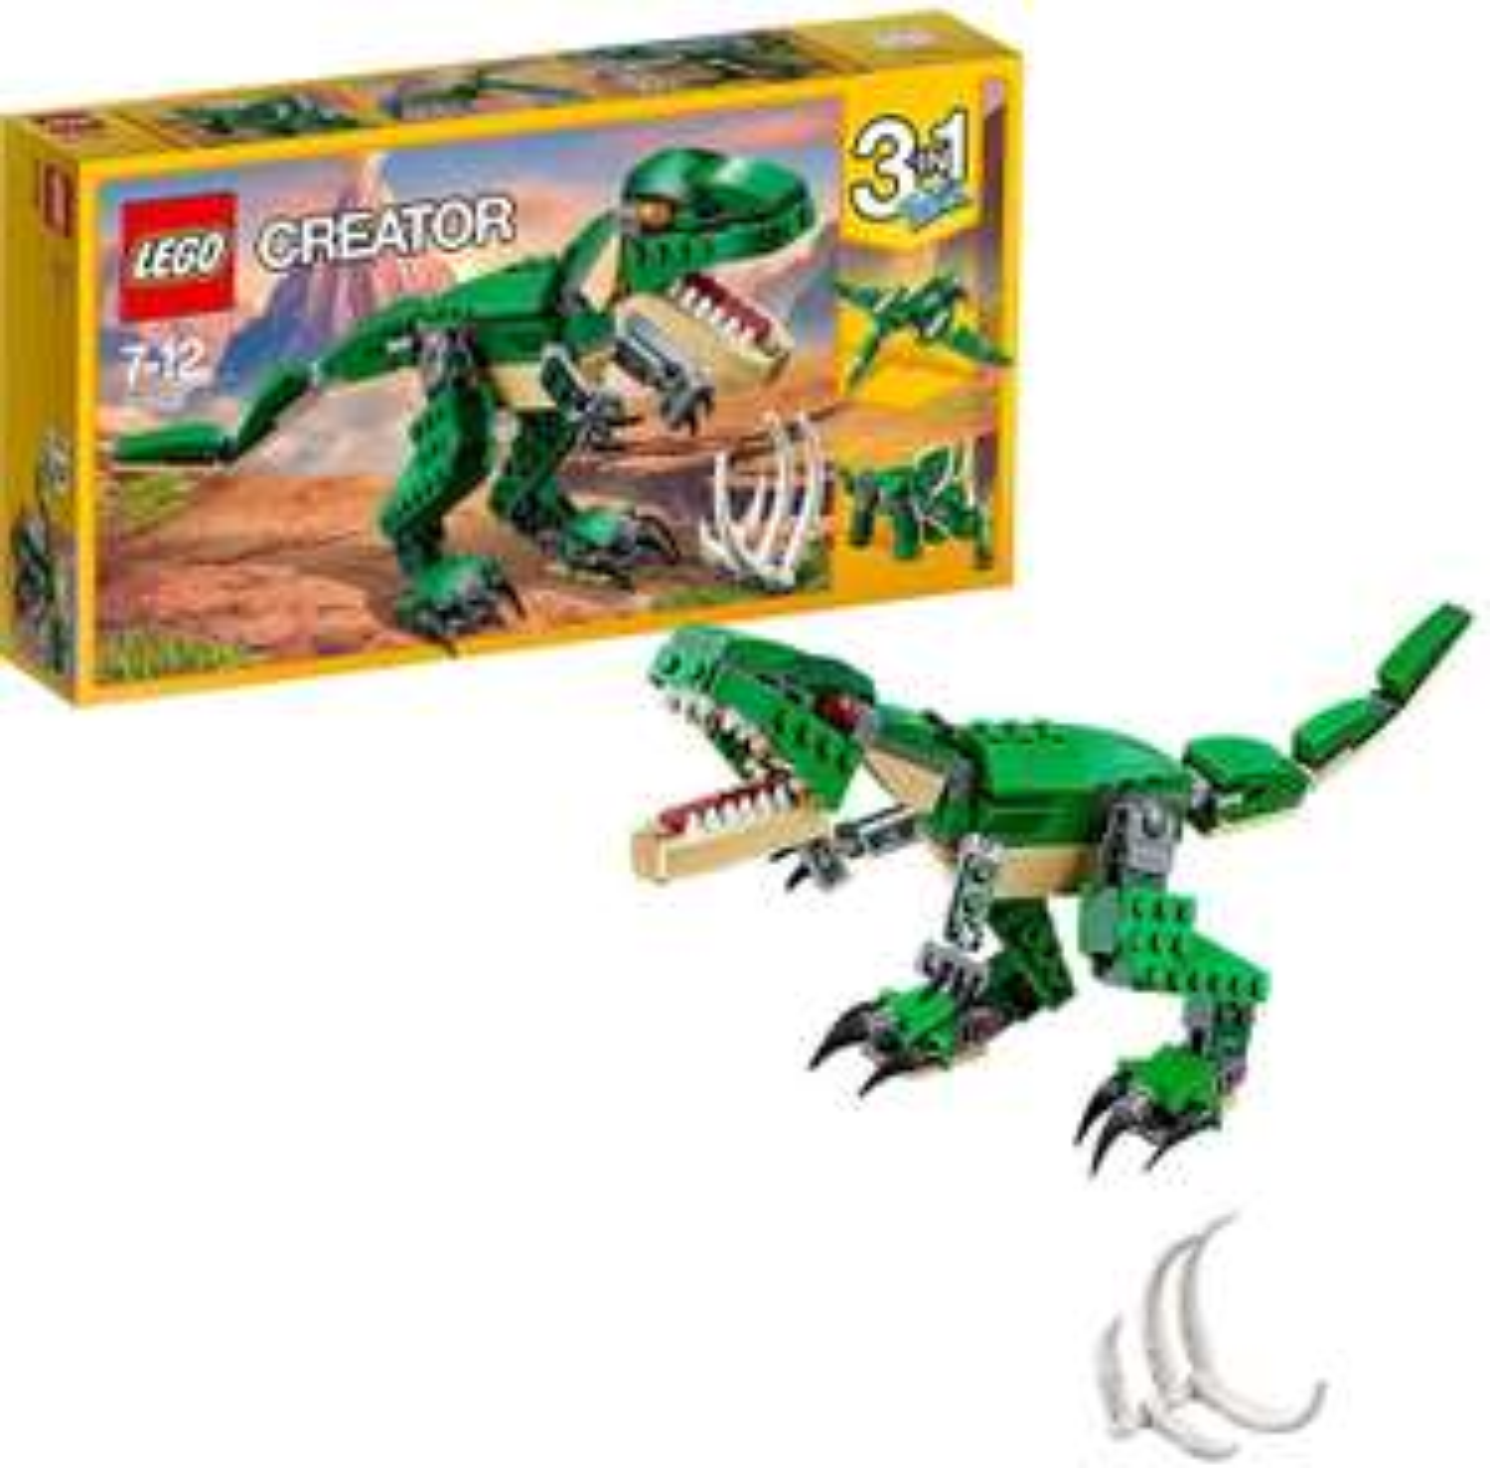 [Amazon Prime] LEGO Creator 31058 - Dinosaurier, 3-in-1 für 9,99€